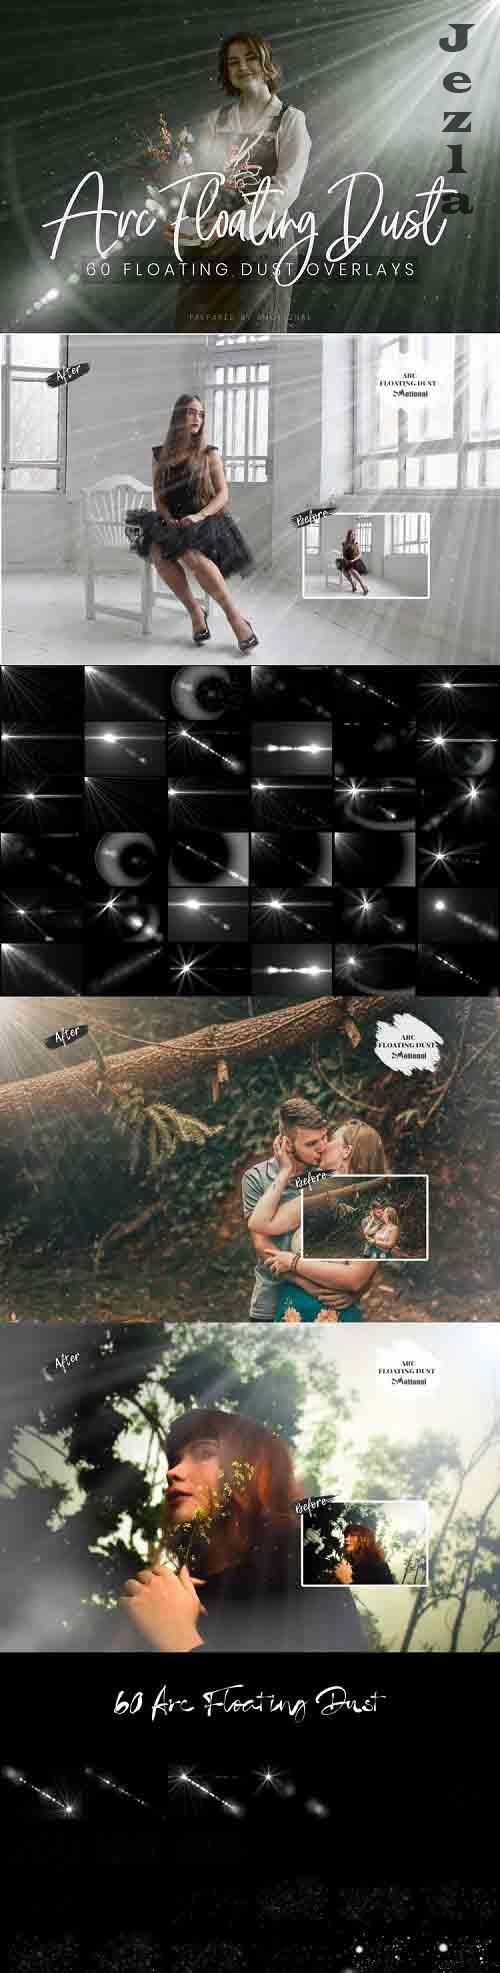 60 ARC Floating Dust Flare Effect Photo Overlays - 774826